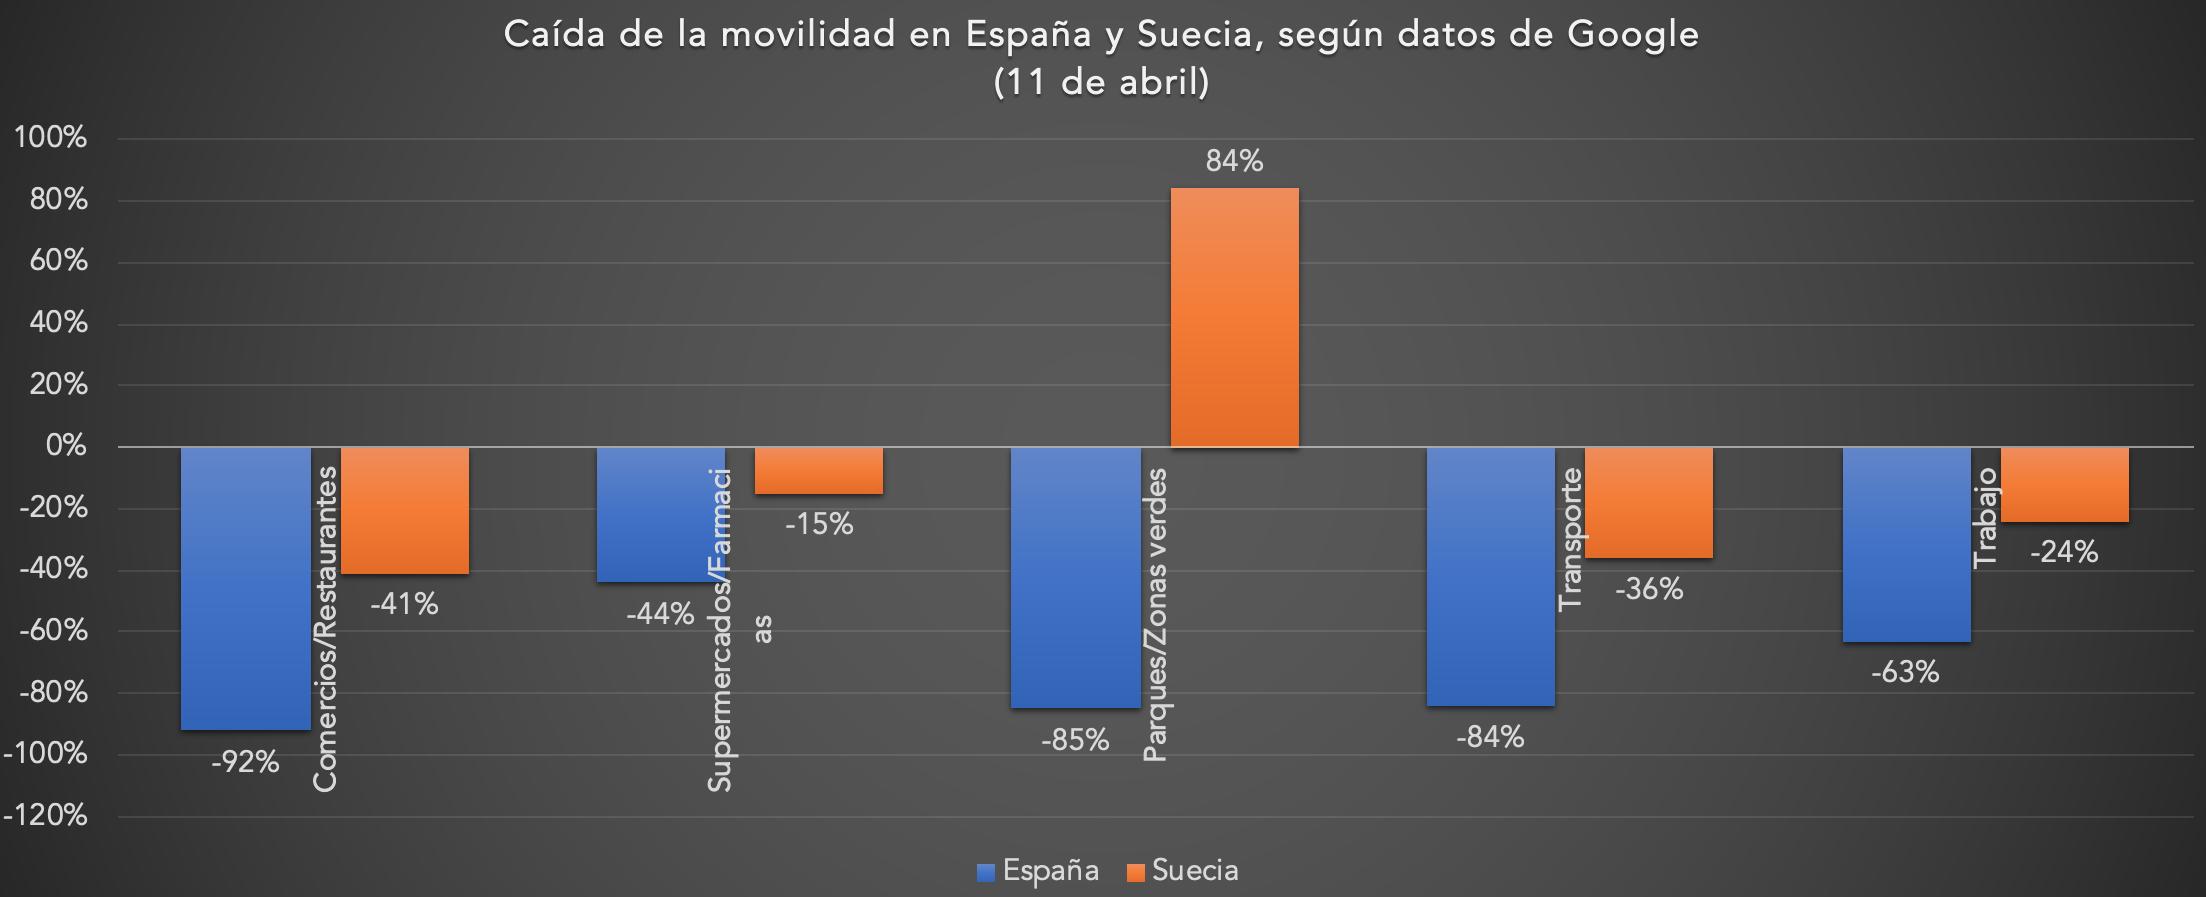 02-caida-movilidad-espana-suecia-coronav